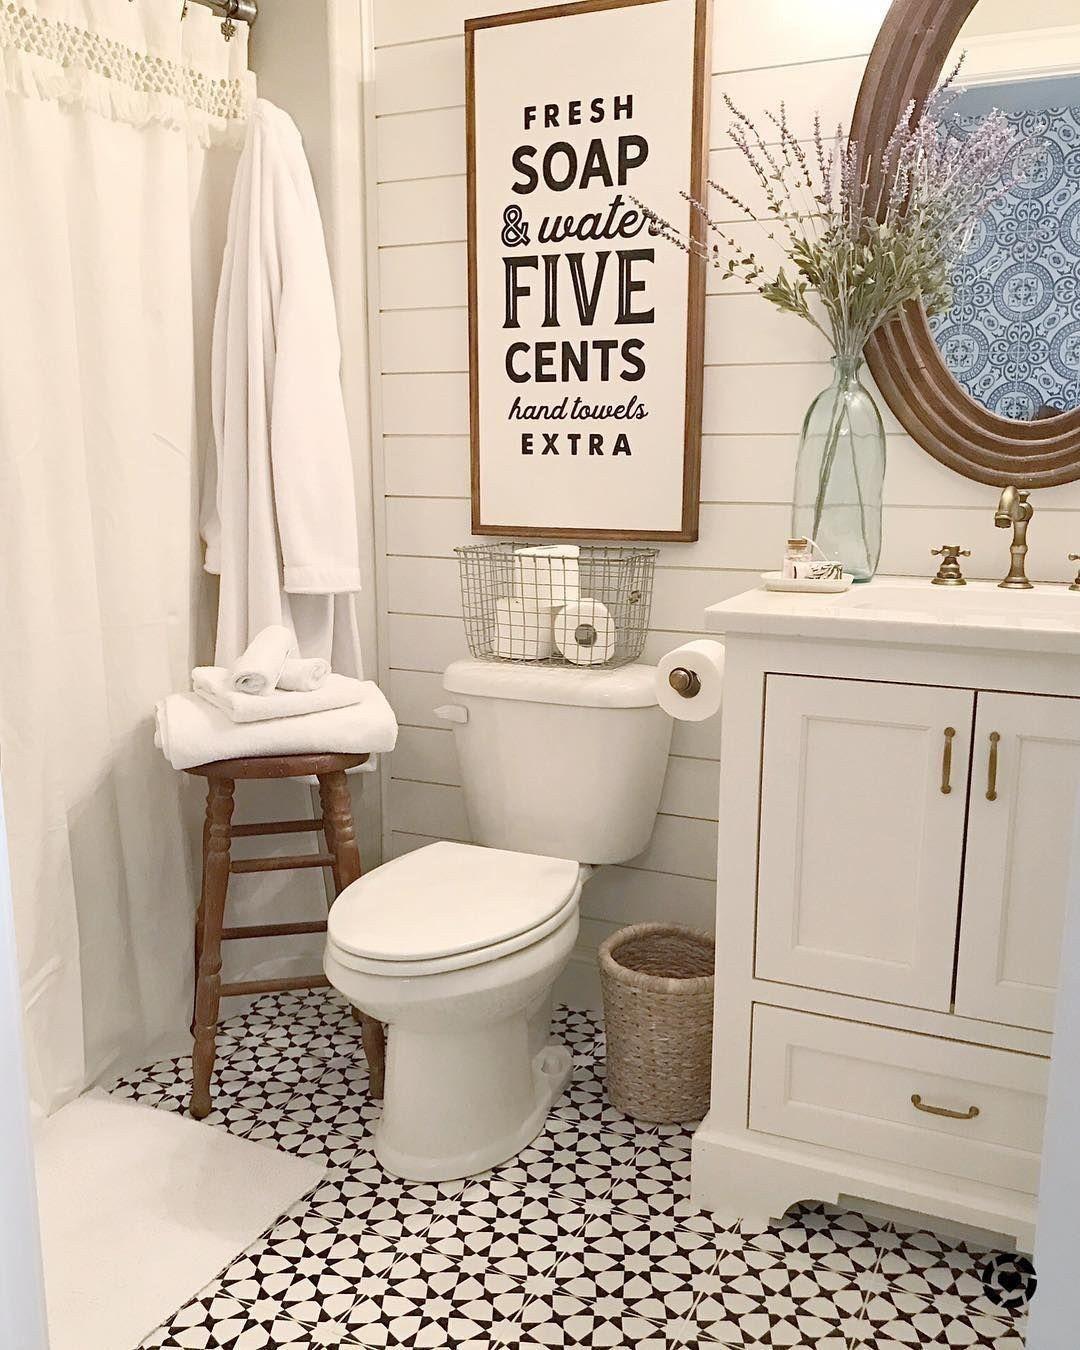 30 Stunning Modern Farmhouse Bathroom Decor Ideas - rengusuk.com